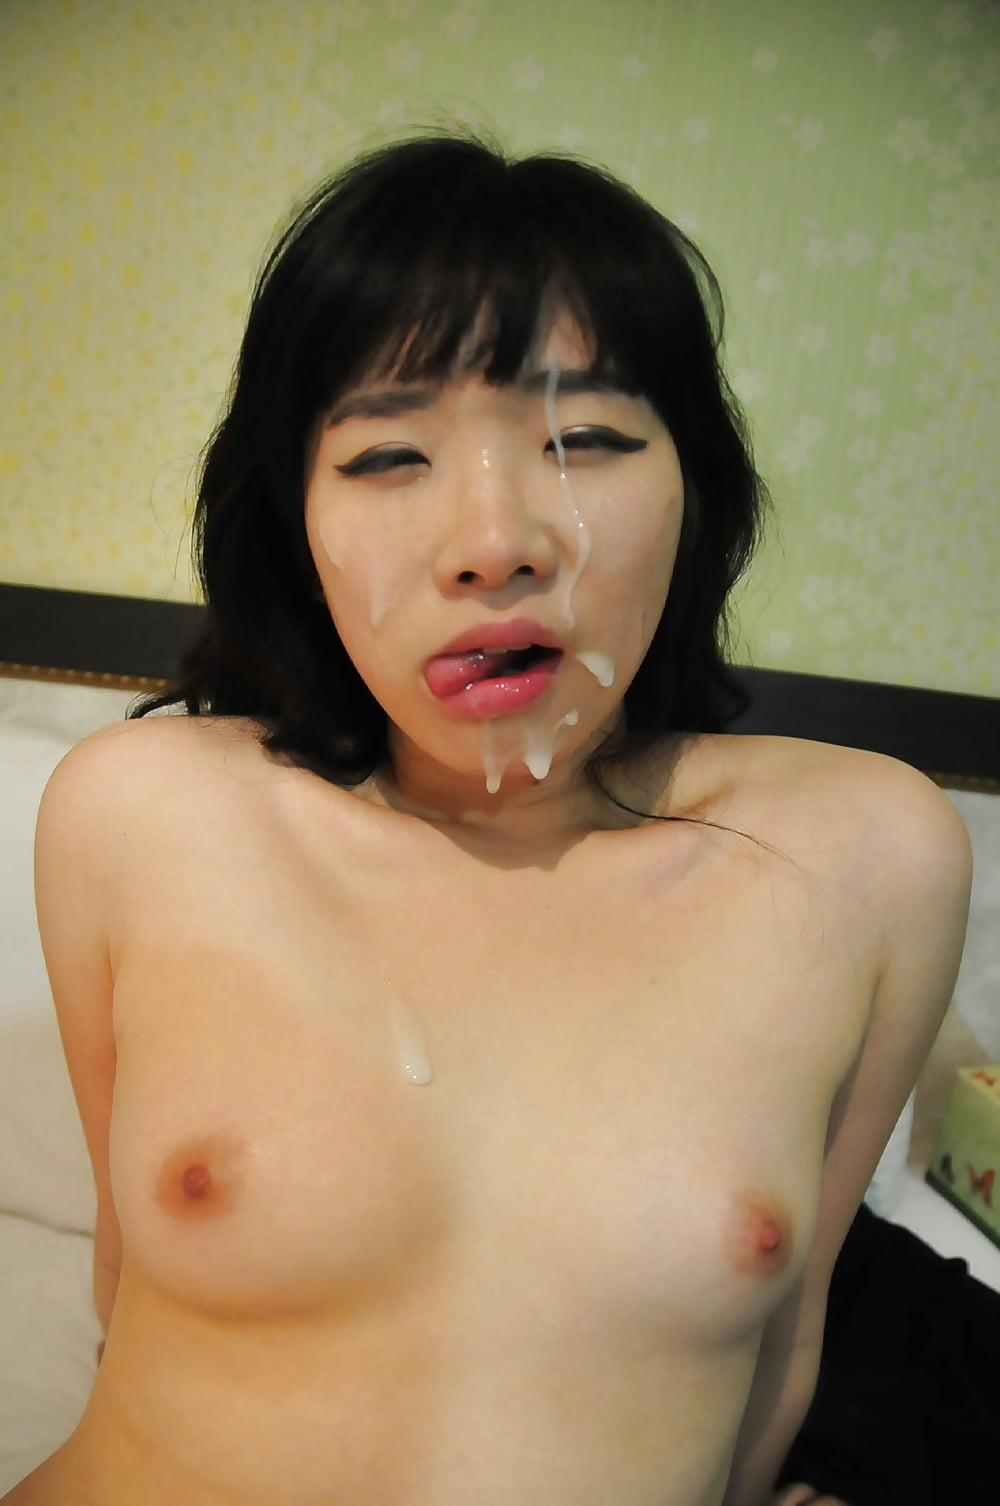 Ryo anime porn cheerleader